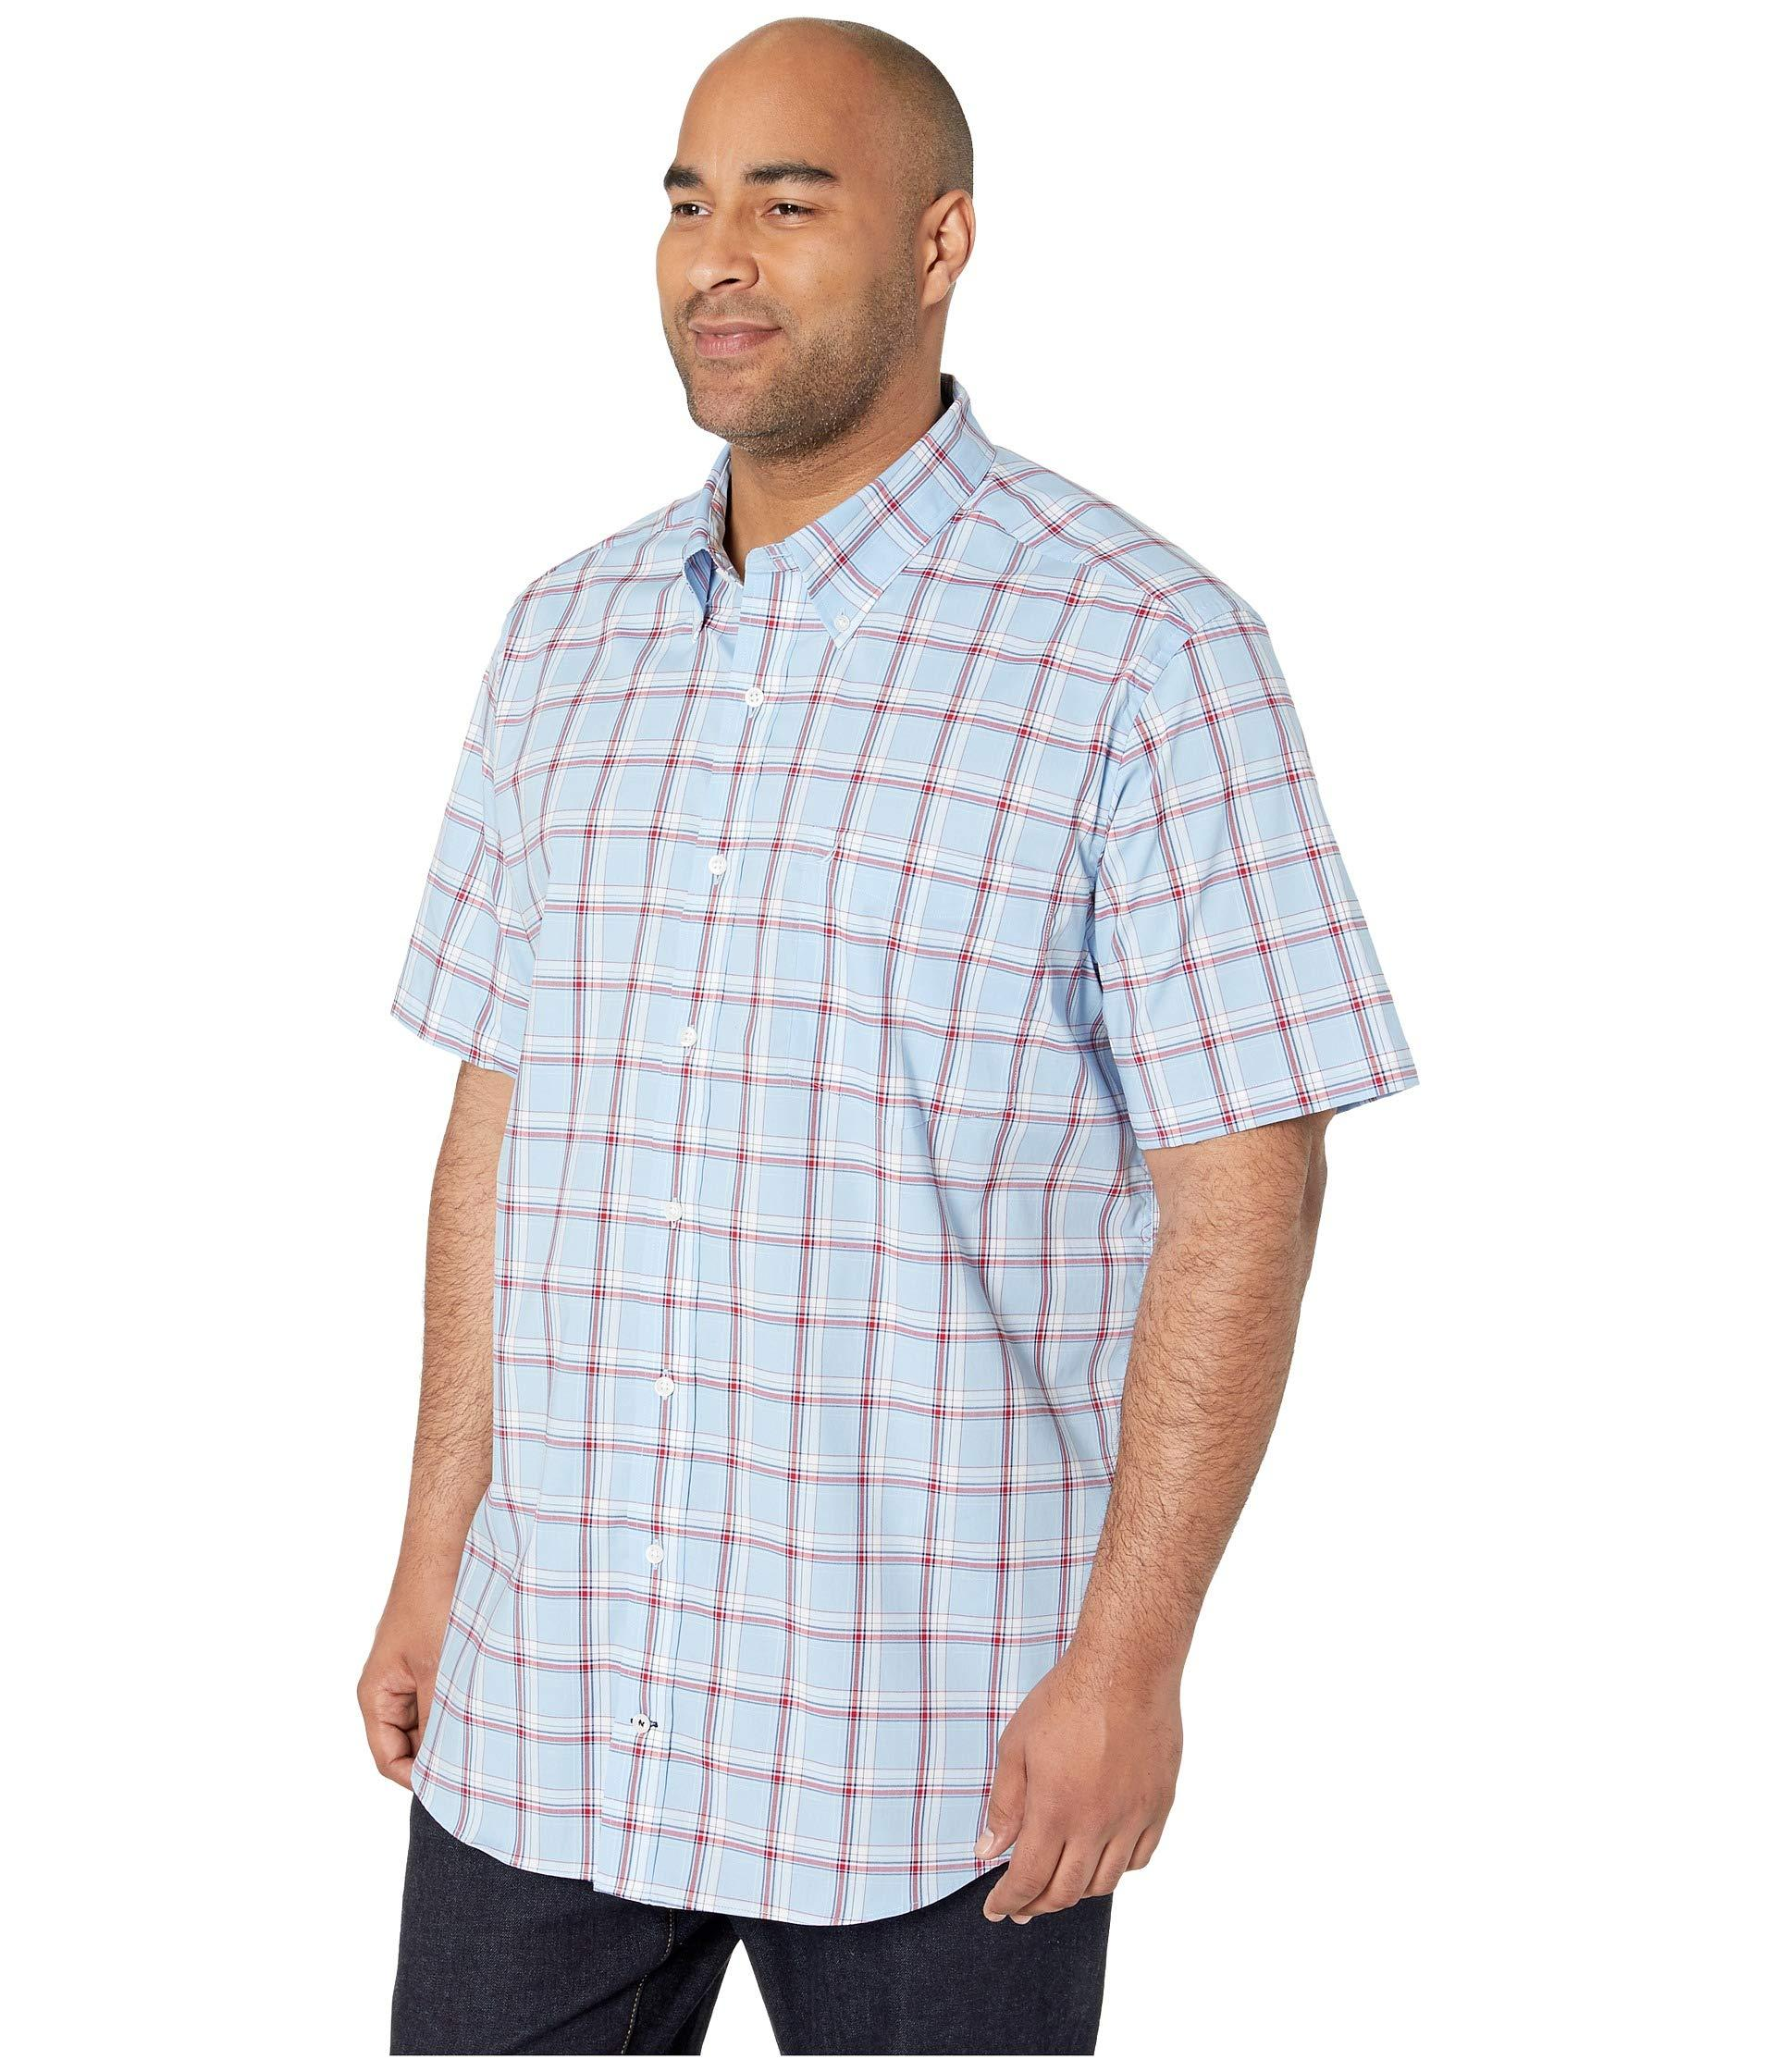 33b392adf38a18 Mens Short Sleeve Dress Shirts Big And Tall | Azərbaycan Dillər ...